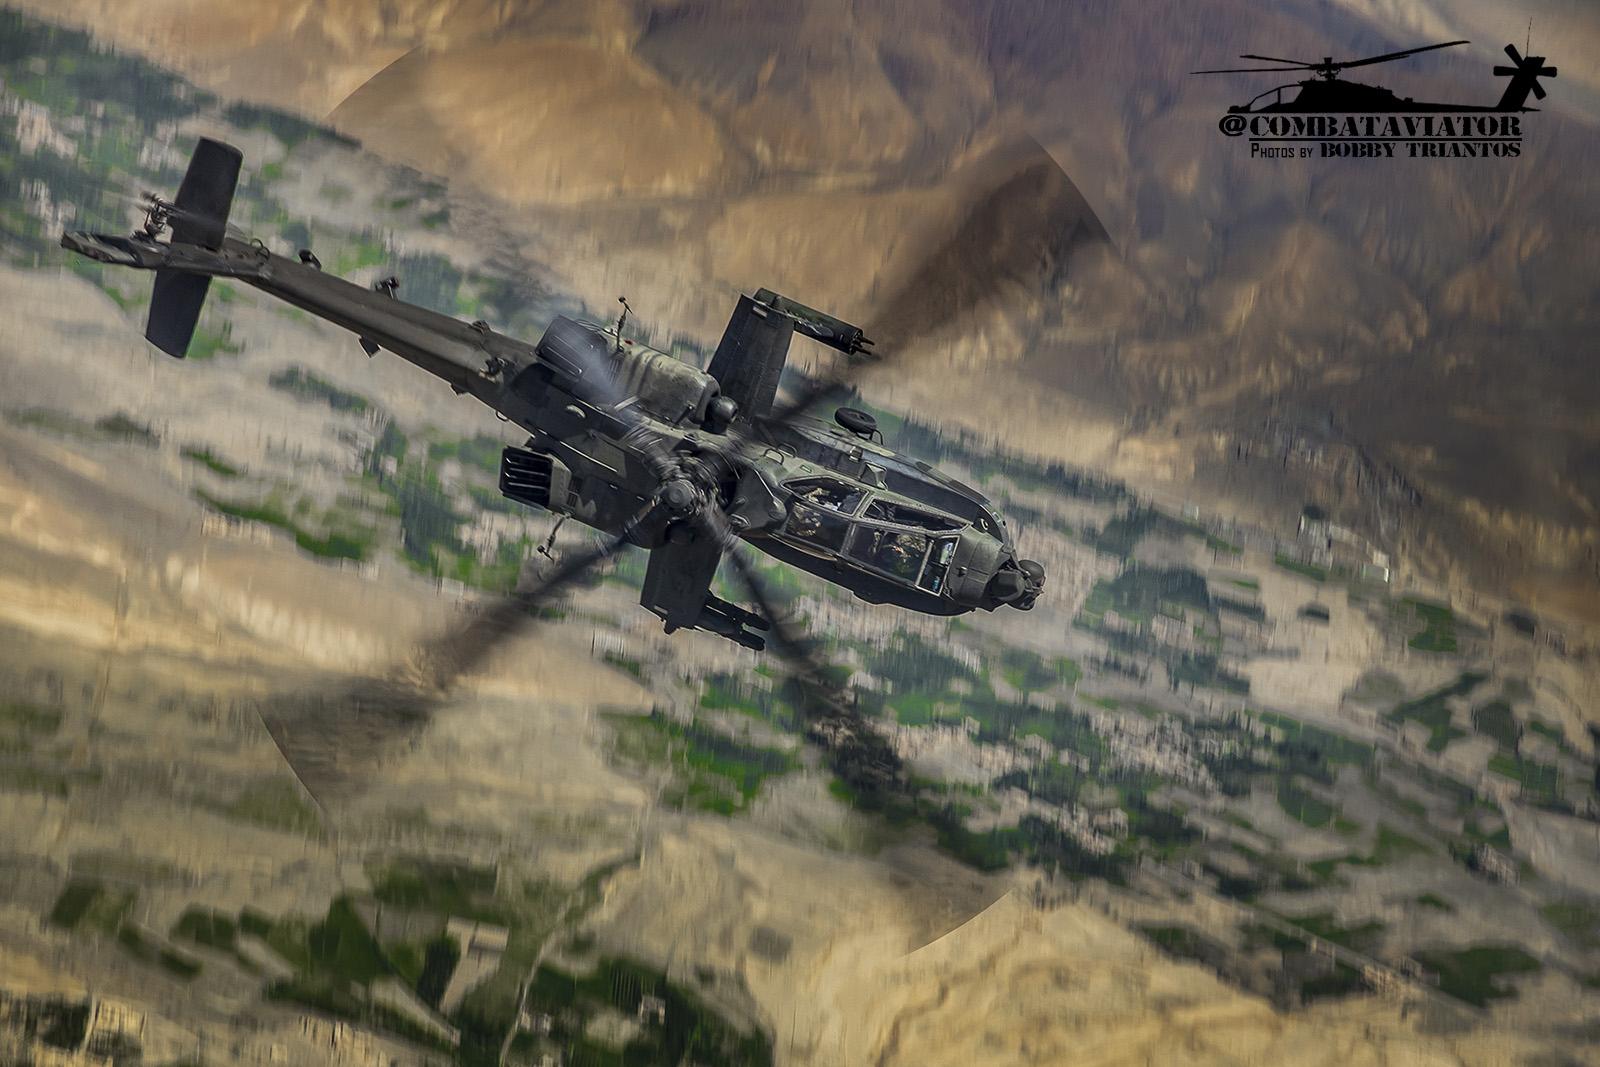 FullDiscAviation_CombatAviator_4.jpg